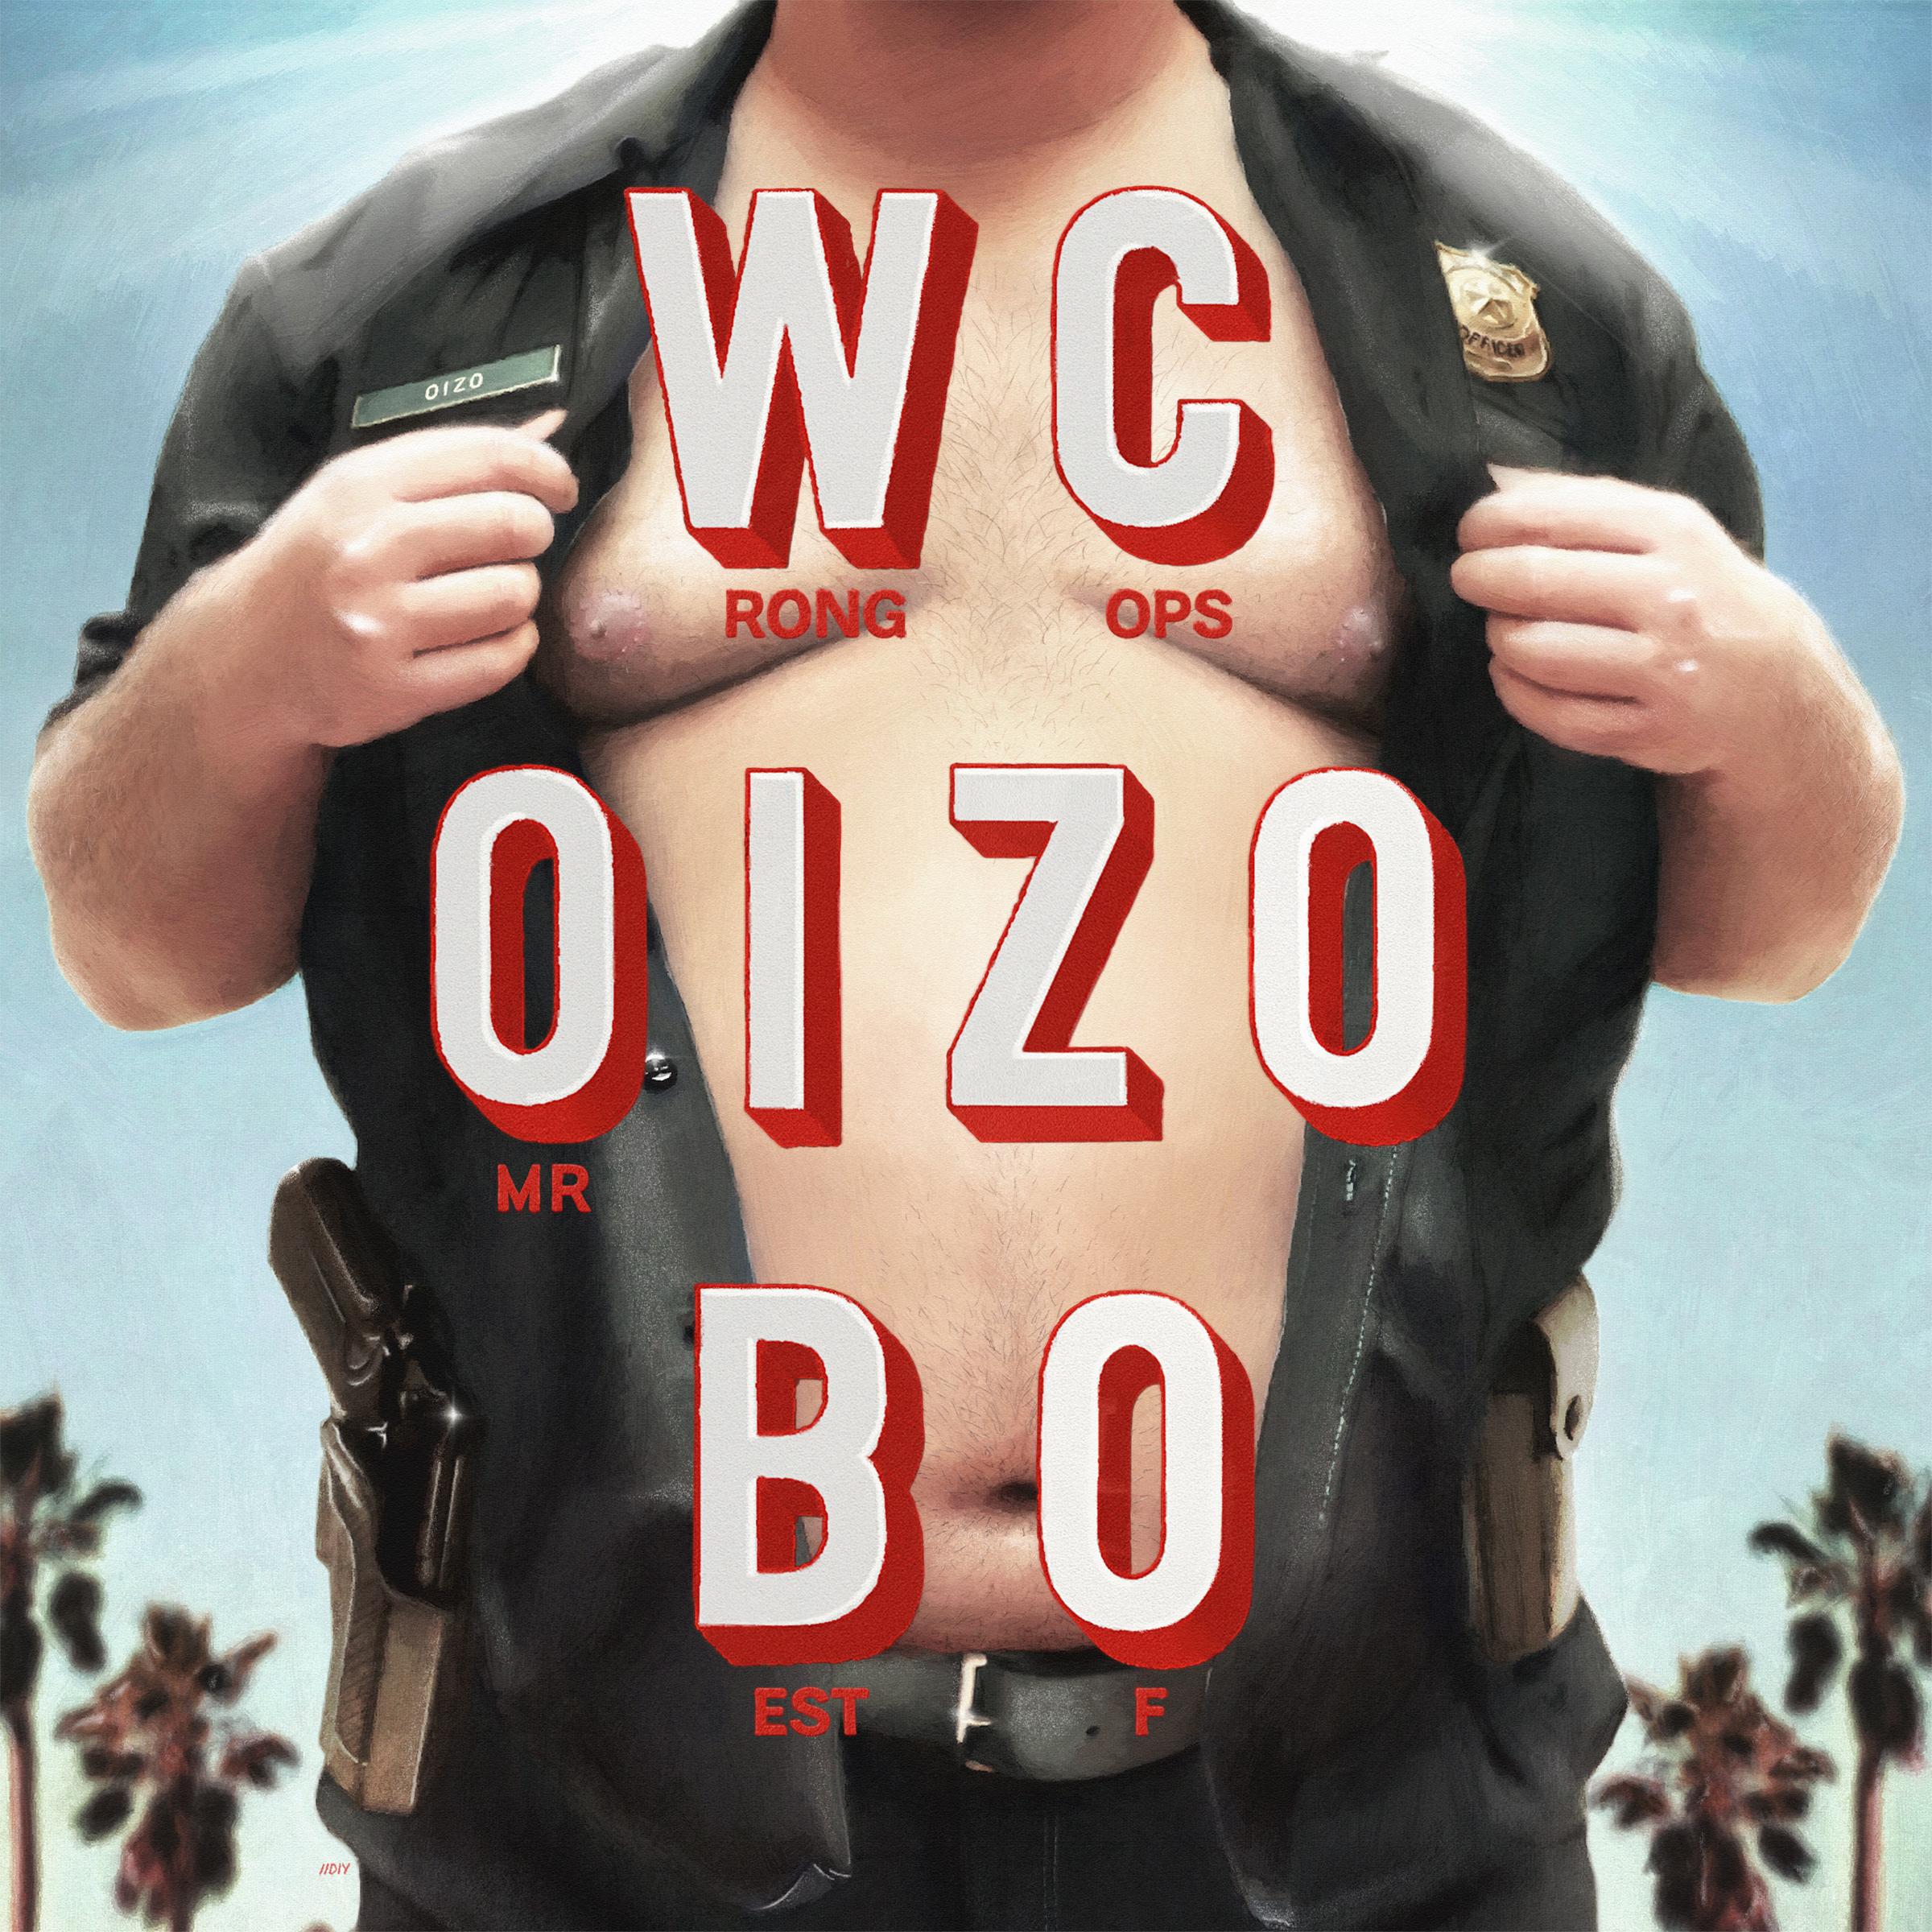 Wrong Cops BO